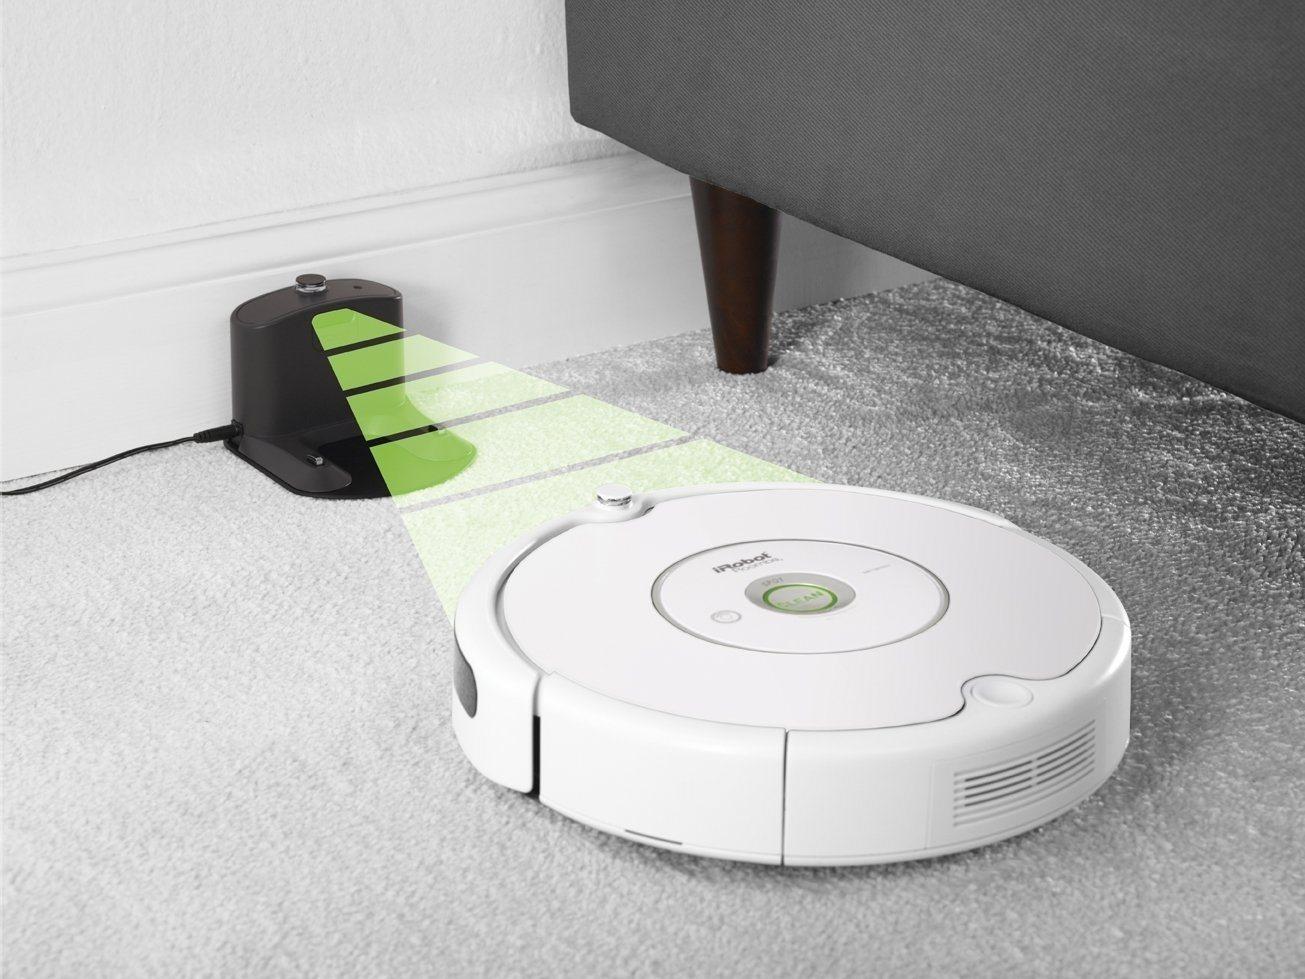 iRobot Roomba 530 // amazon.com